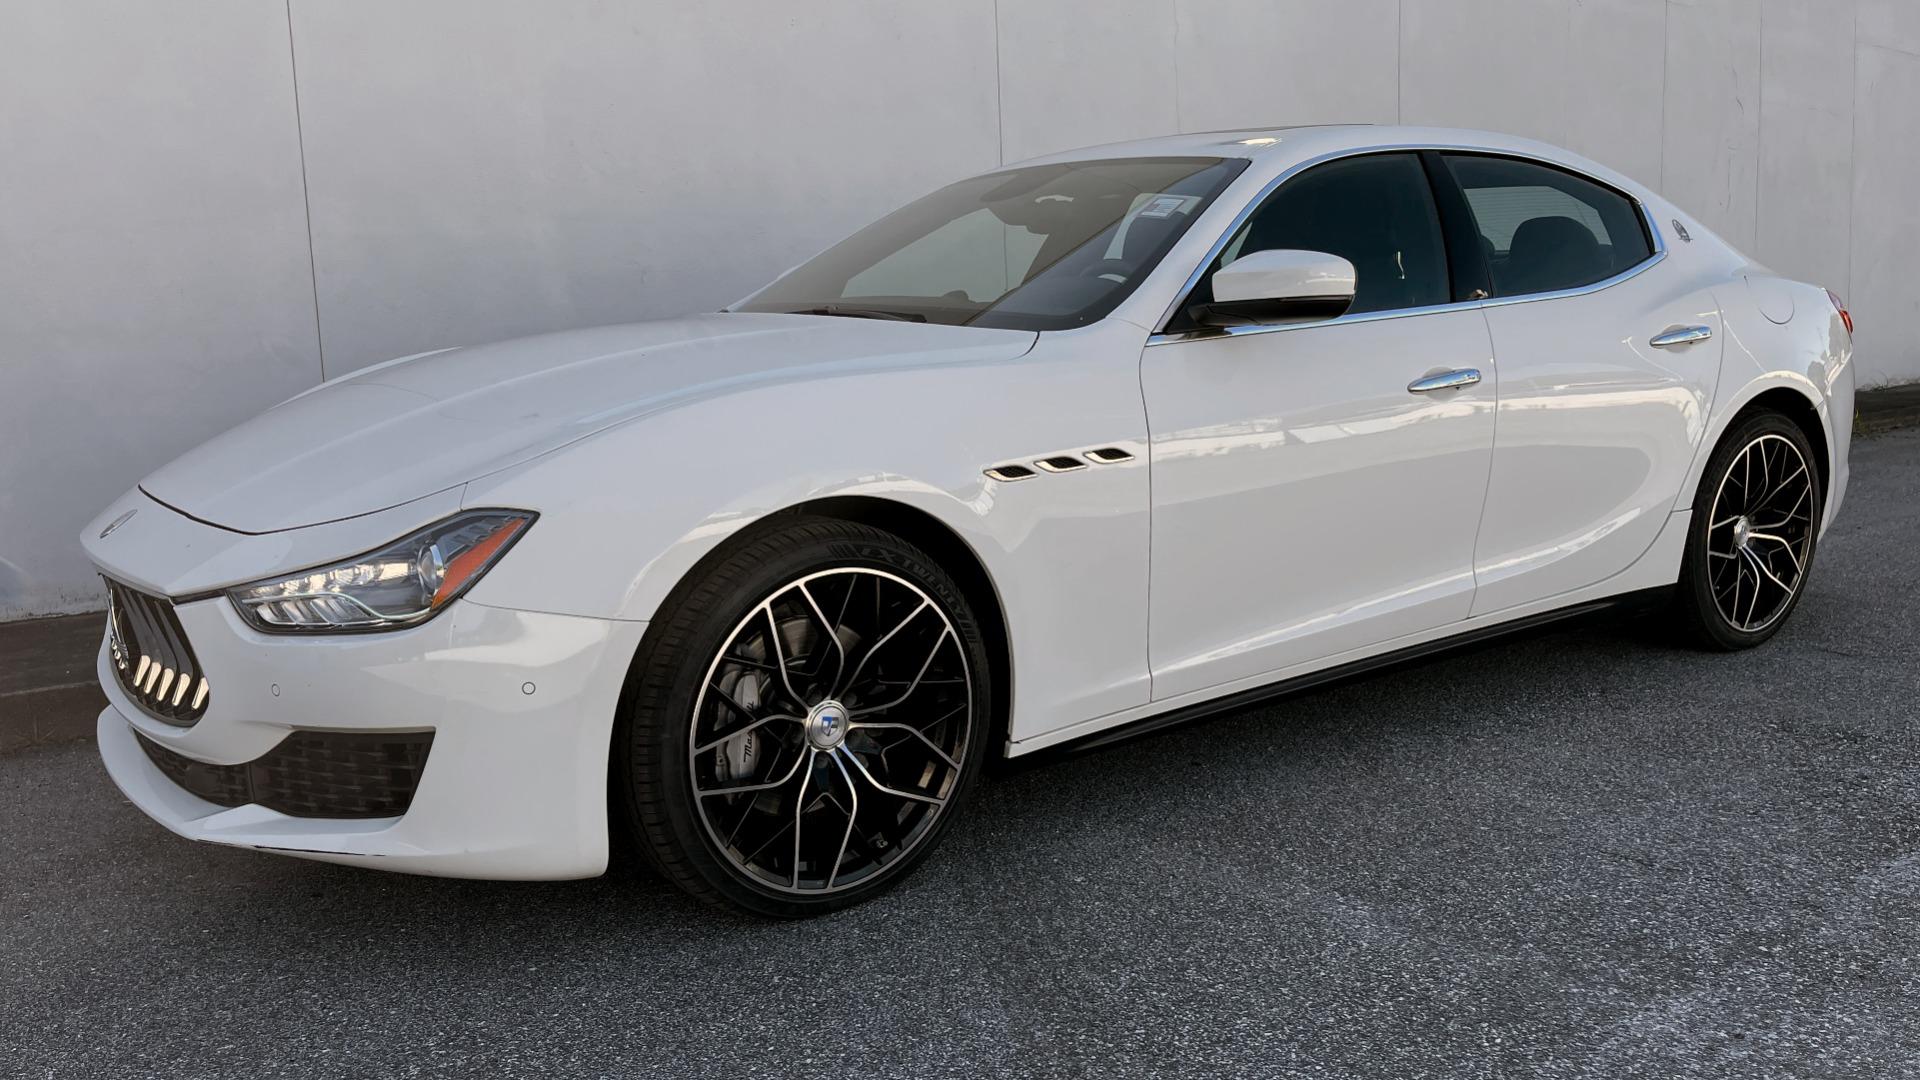 Used 2018 Maserati GHIBLI SEDAN / RWD / 3.0L V6 / SUNROOF / NAV / REARVIEW for sale $42,995 at Formula Imports in Charlotte NC 28227 4